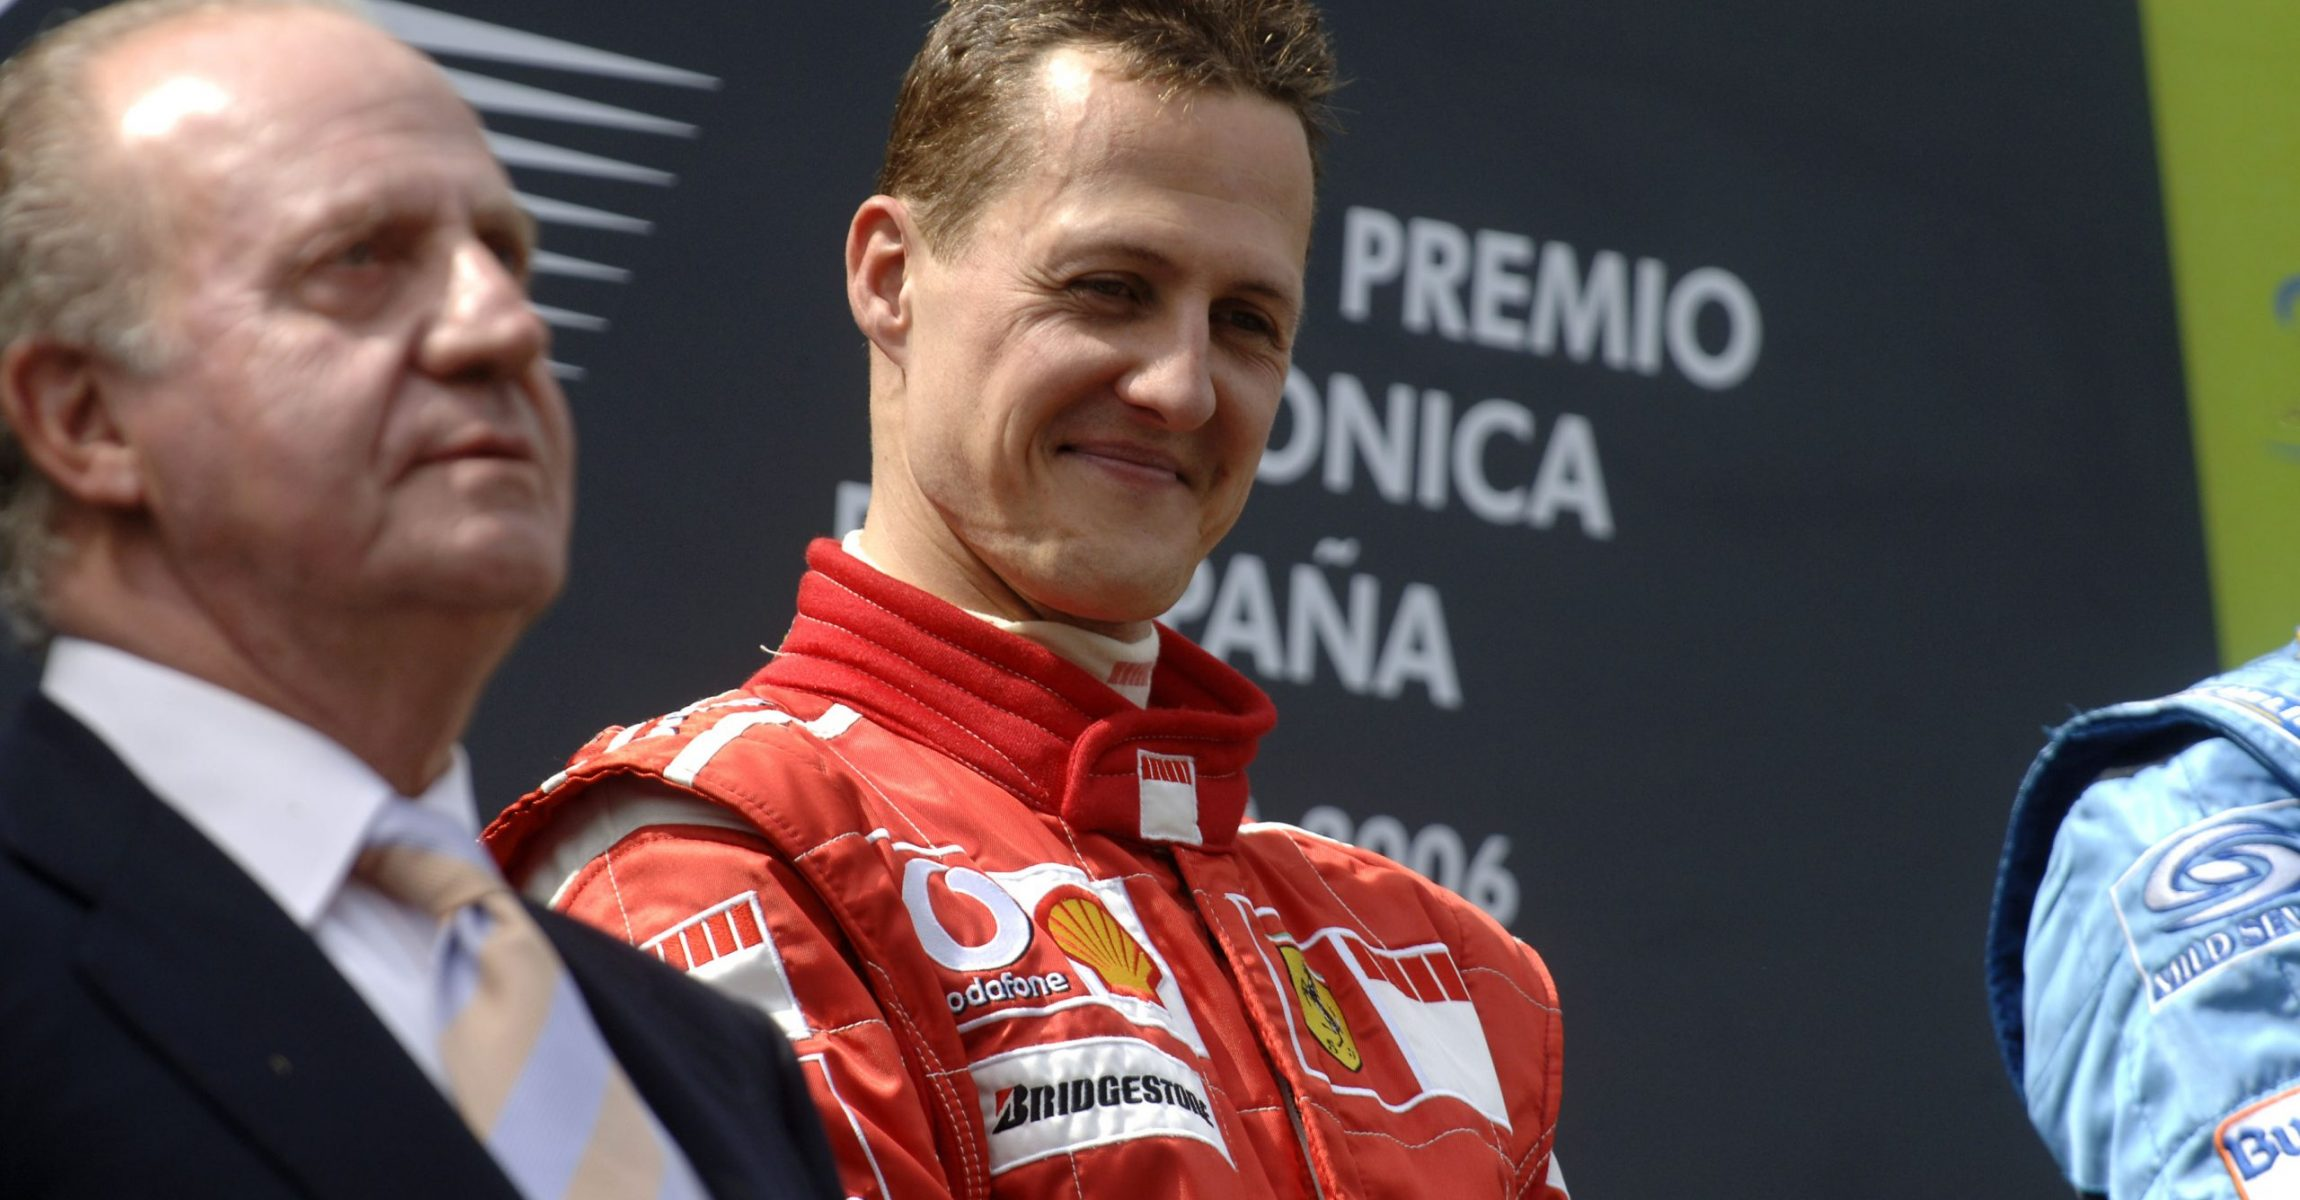 Michael Schumacher, Spanish Grand Prix 2006, Barcelona